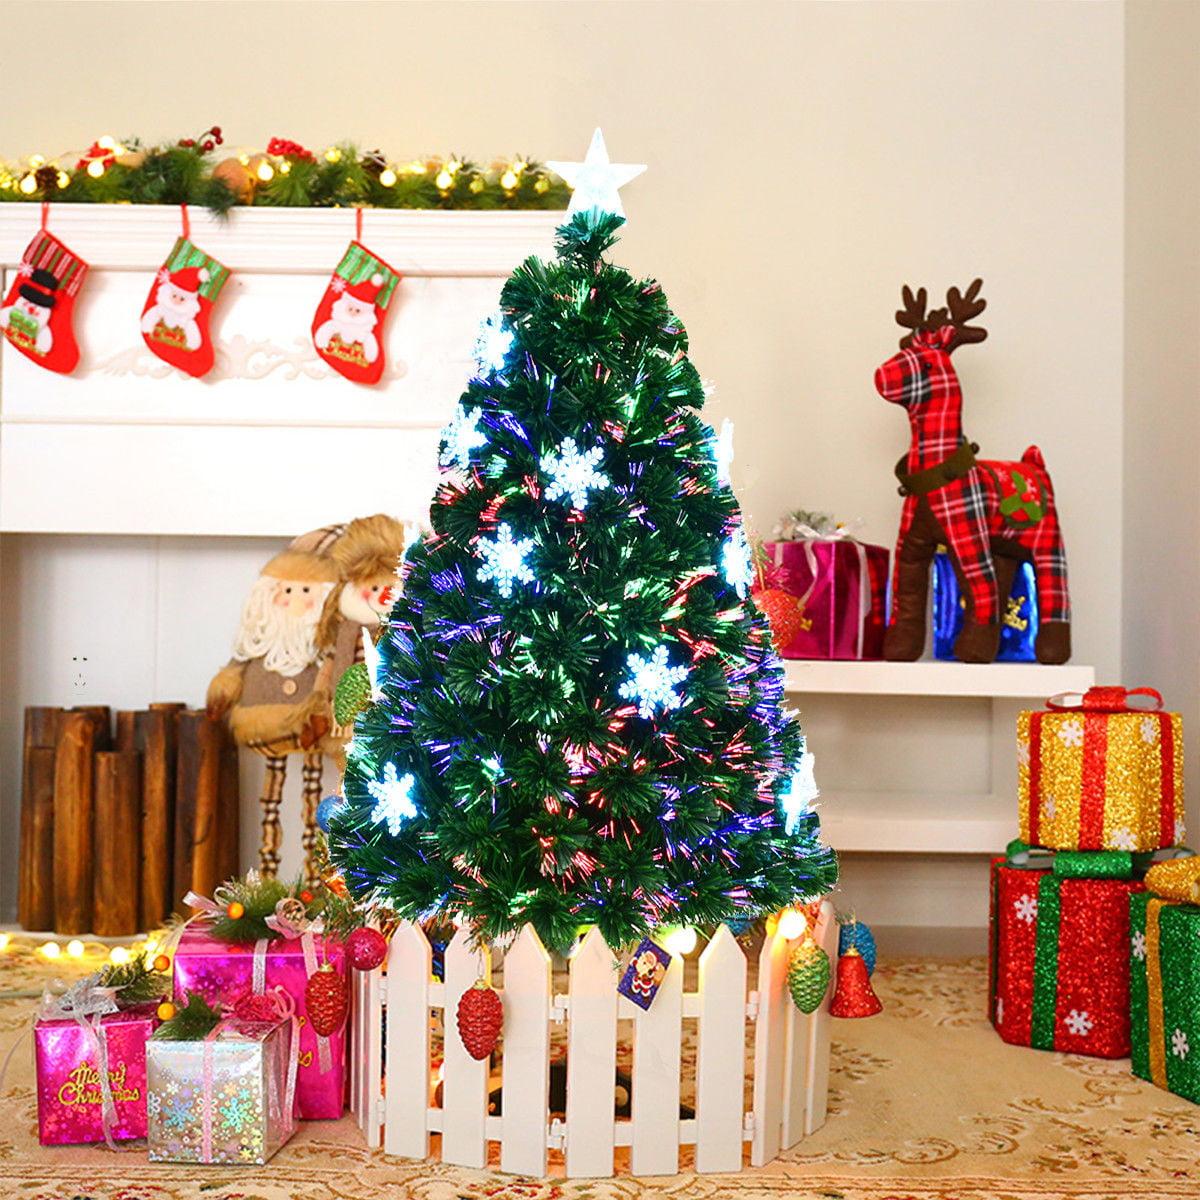 Costway 4'/5'/6'/7'  Pre-Lit Fiber Optic Artificial Christmas Tree w/Multi-Color Lights Snowflakes